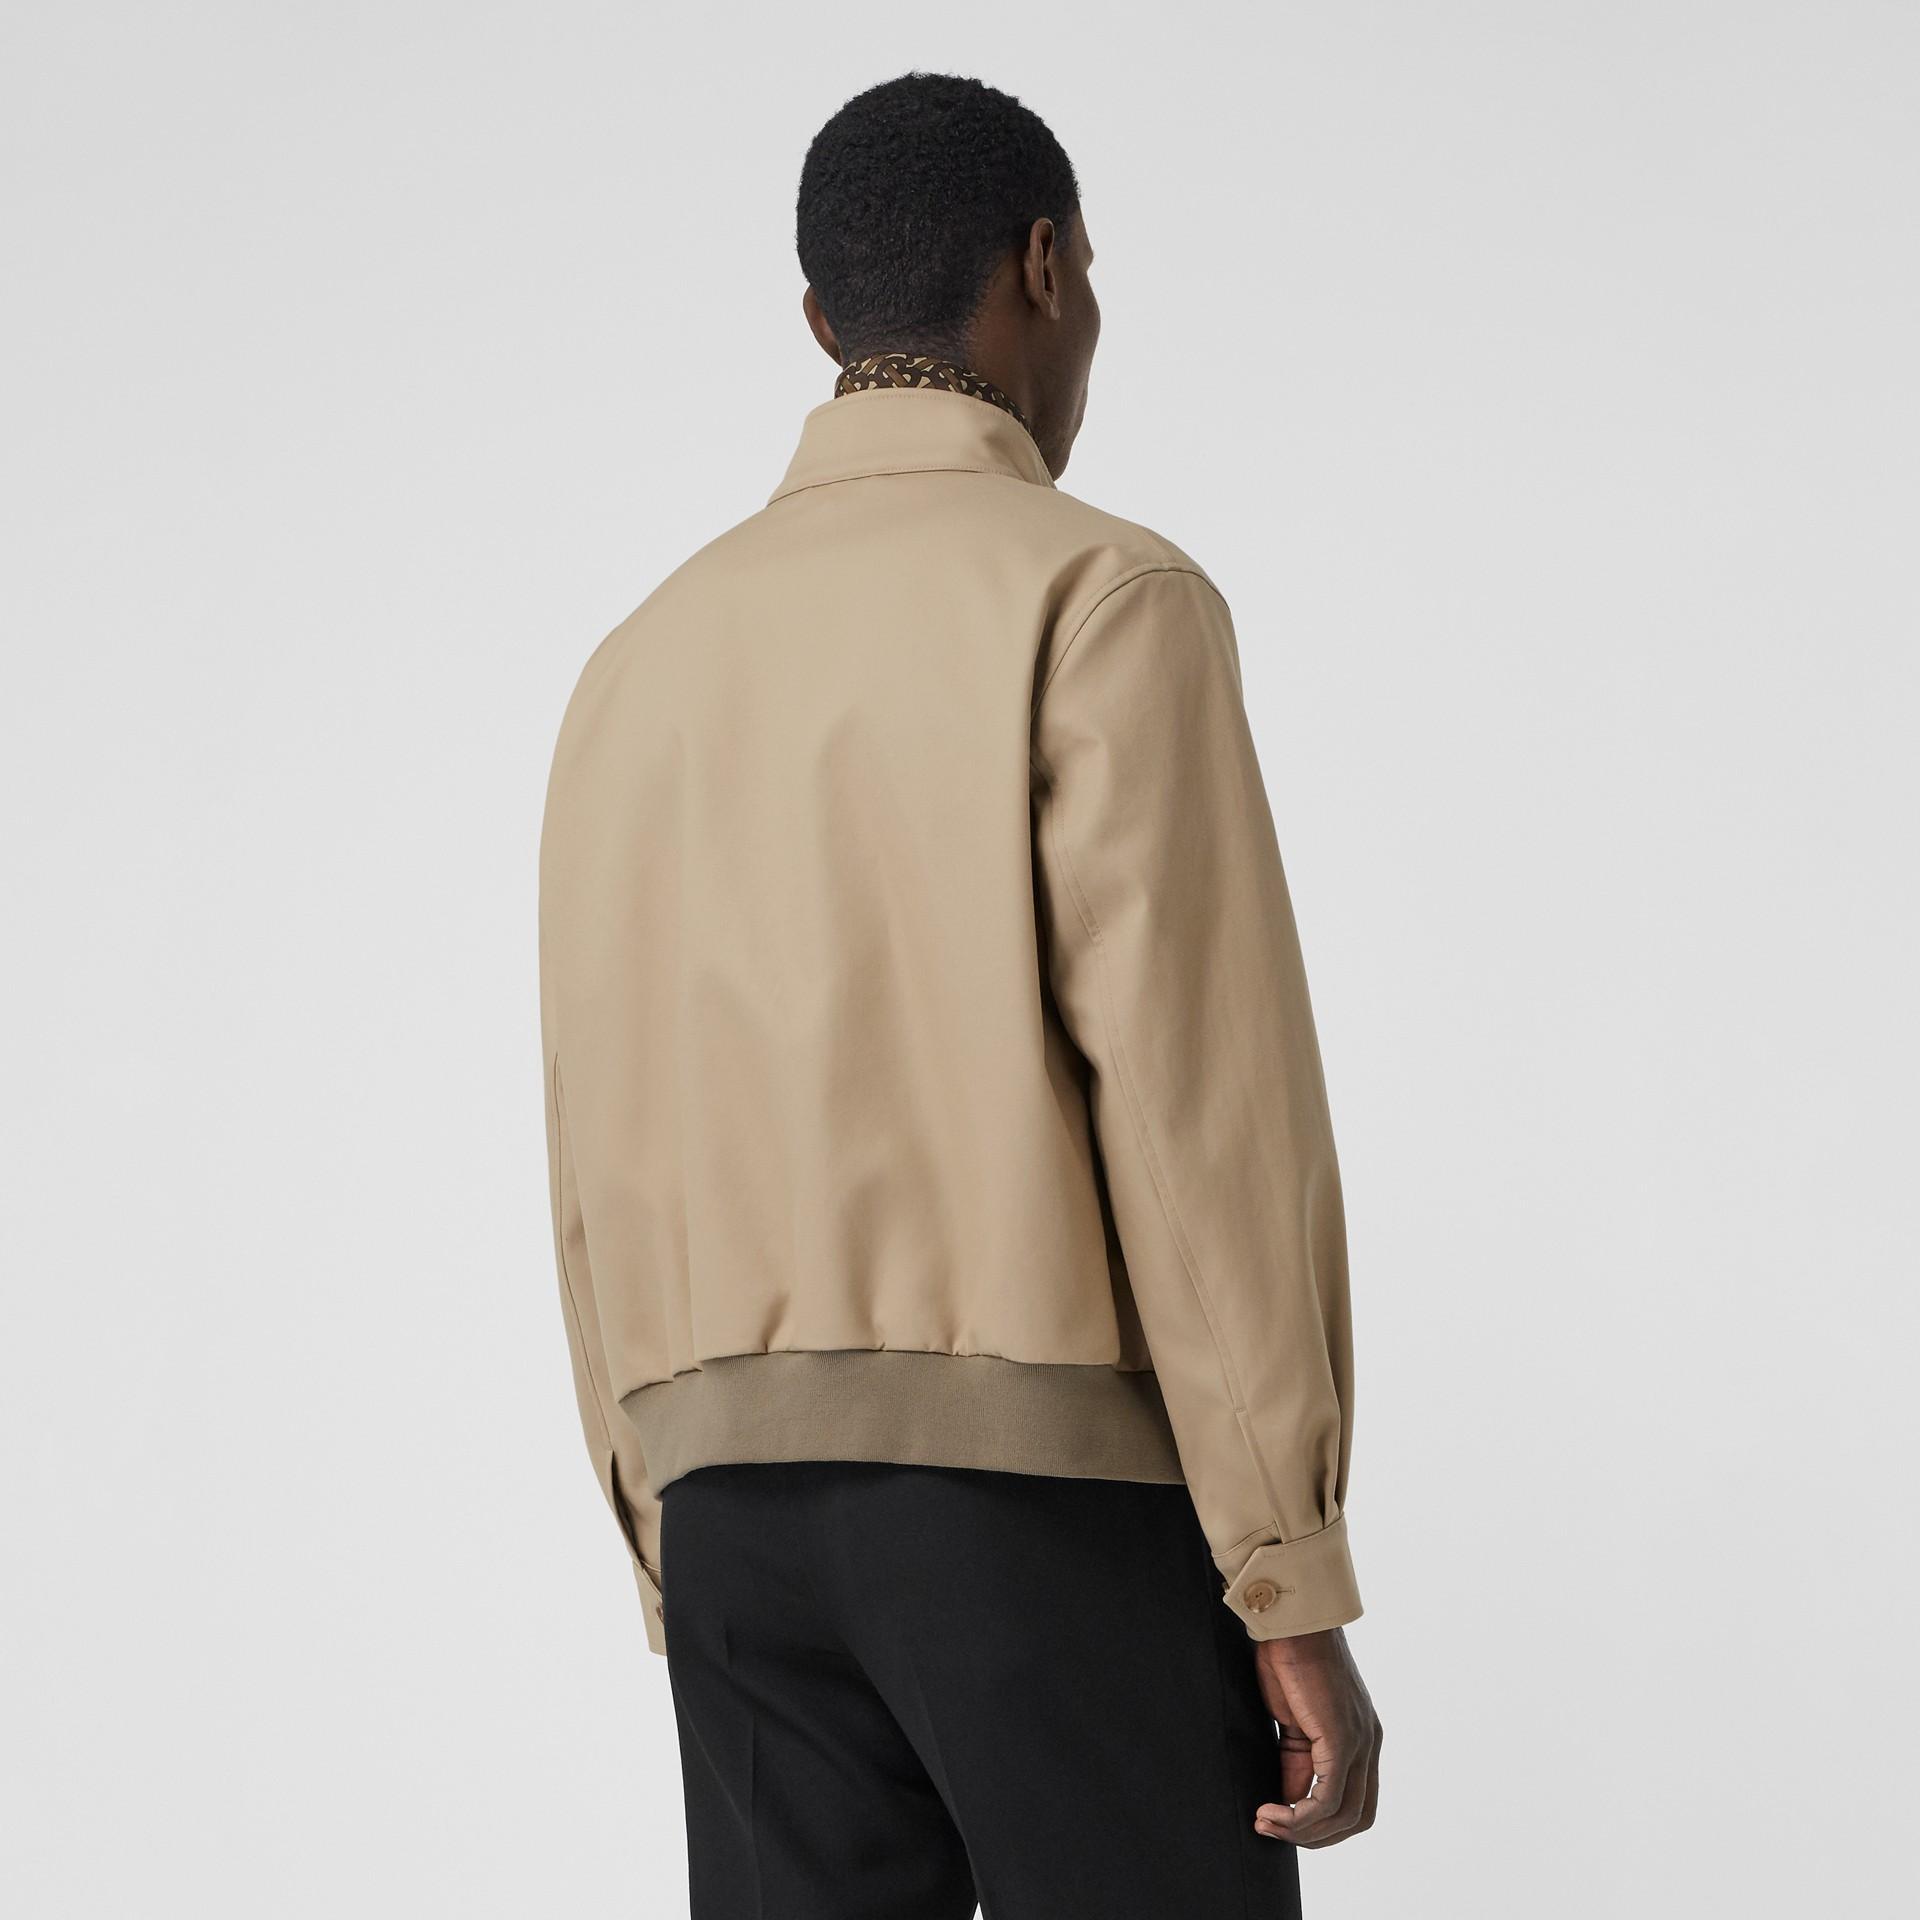 Cotton Harrington Jacket with Detachable Warmer in Honey - Men | Burberry - gallery image 2